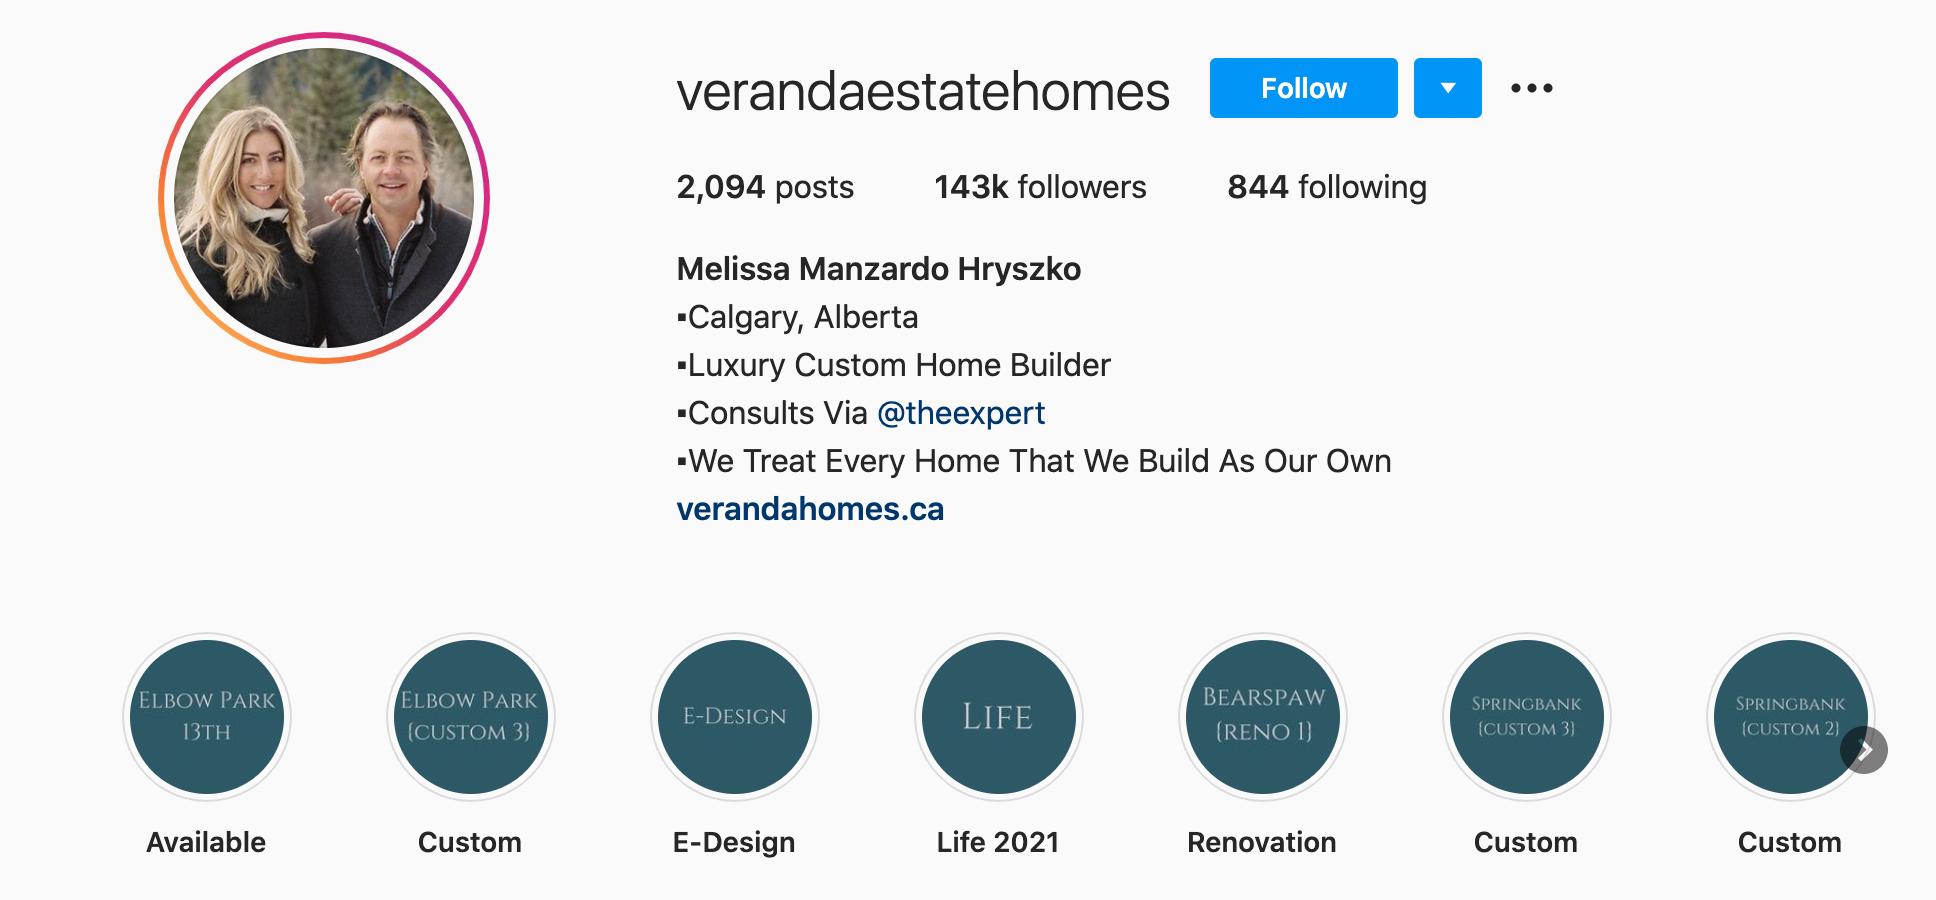 verandaestatehomes-instagram-profile